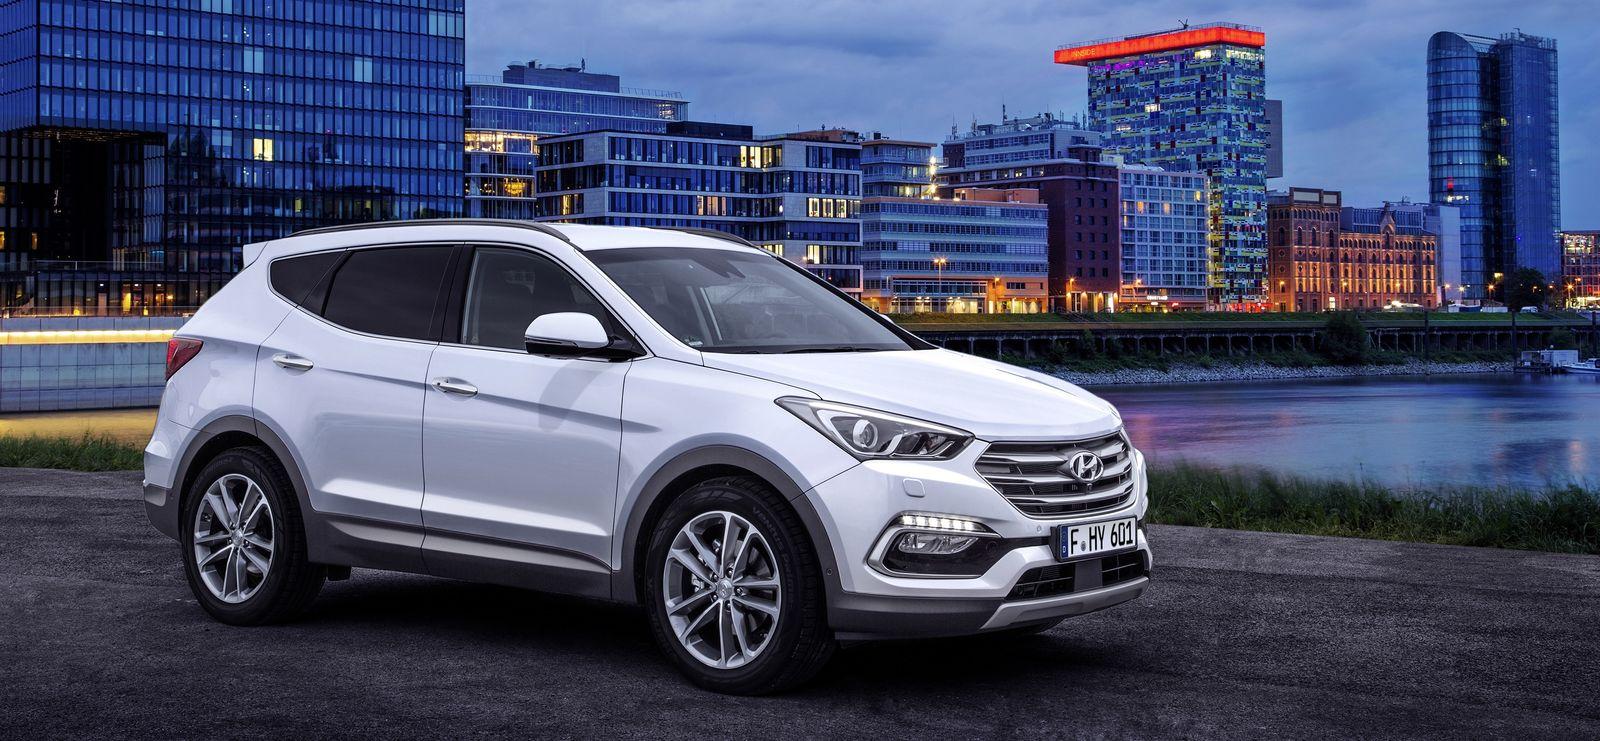 Hyundai Santa Fe sizes and diions guide | carwow